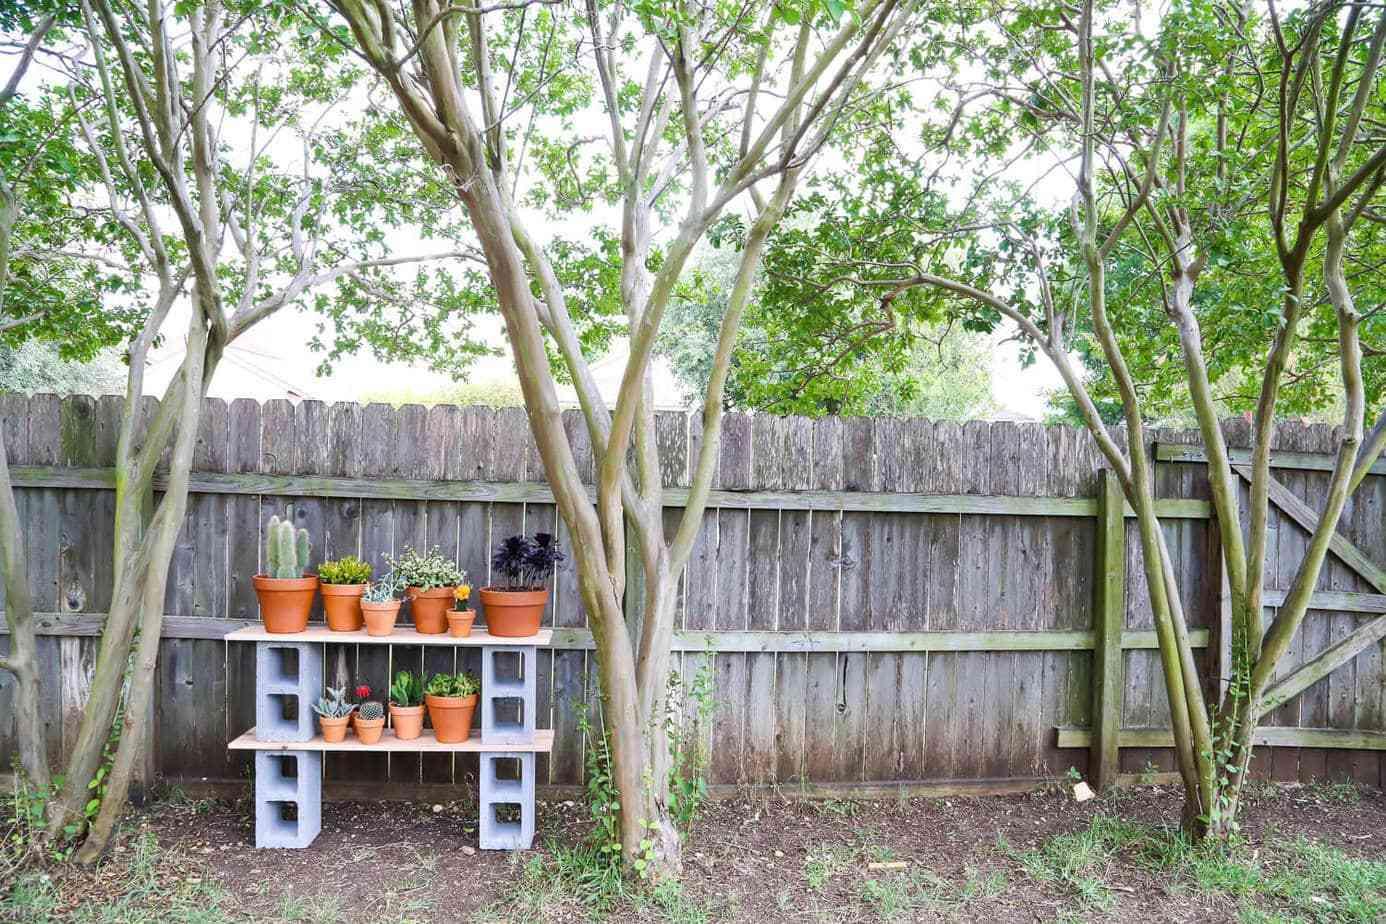 A cinder block plant shelf in a backyard